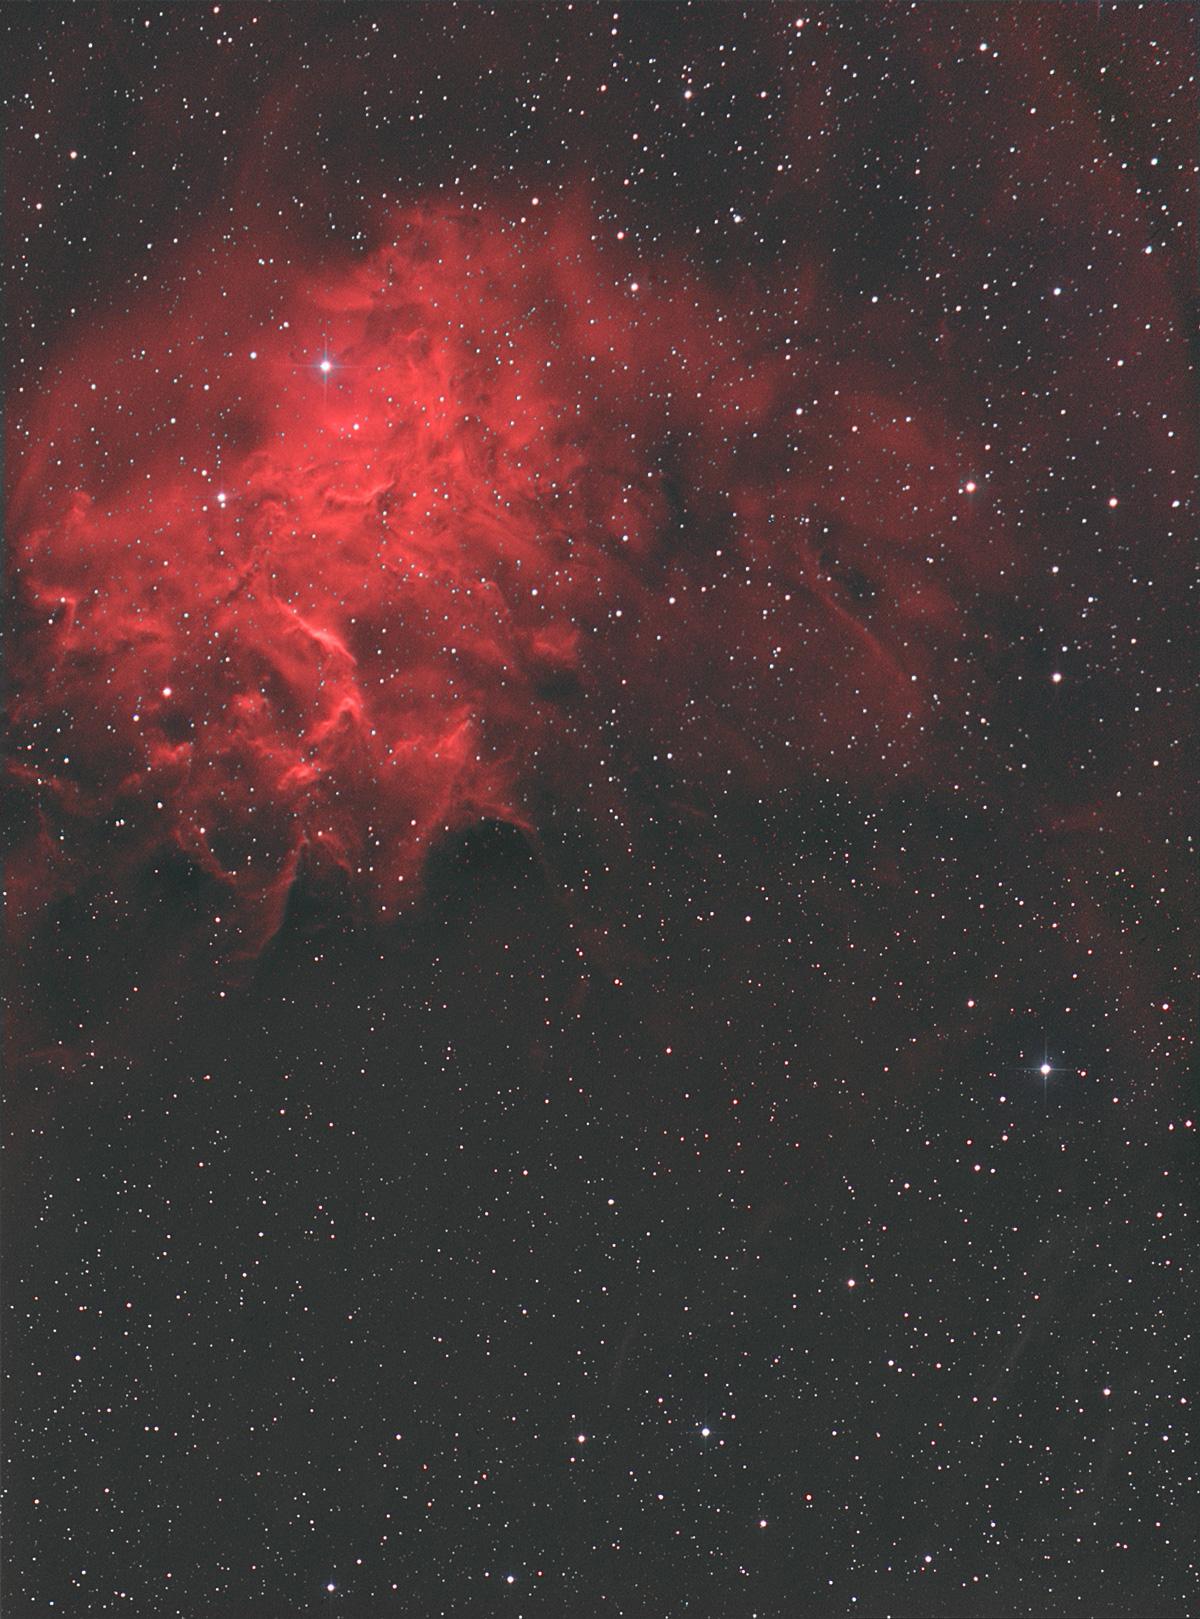 Ciel profond d'hiver - Page 12 Ic405_1200_3